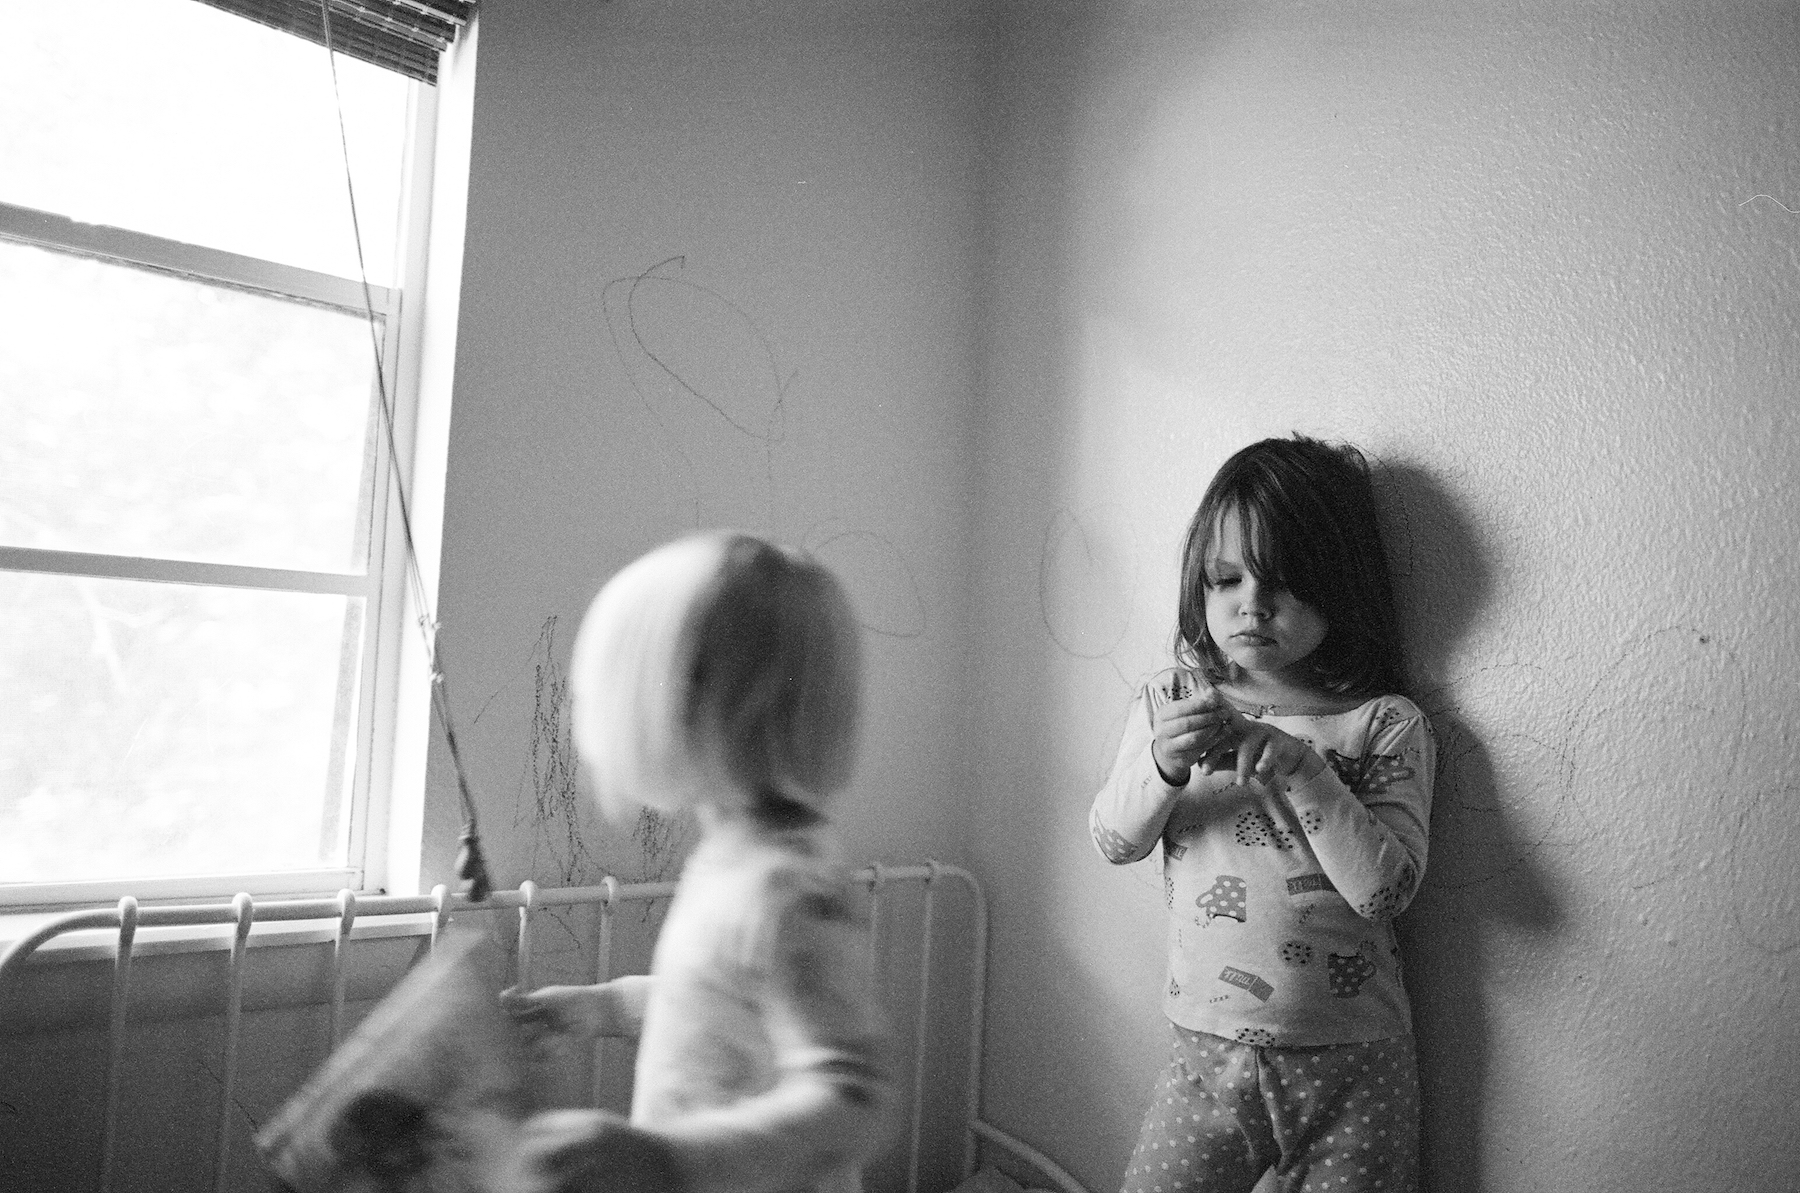 film-photography-oklahoma-002.jpg